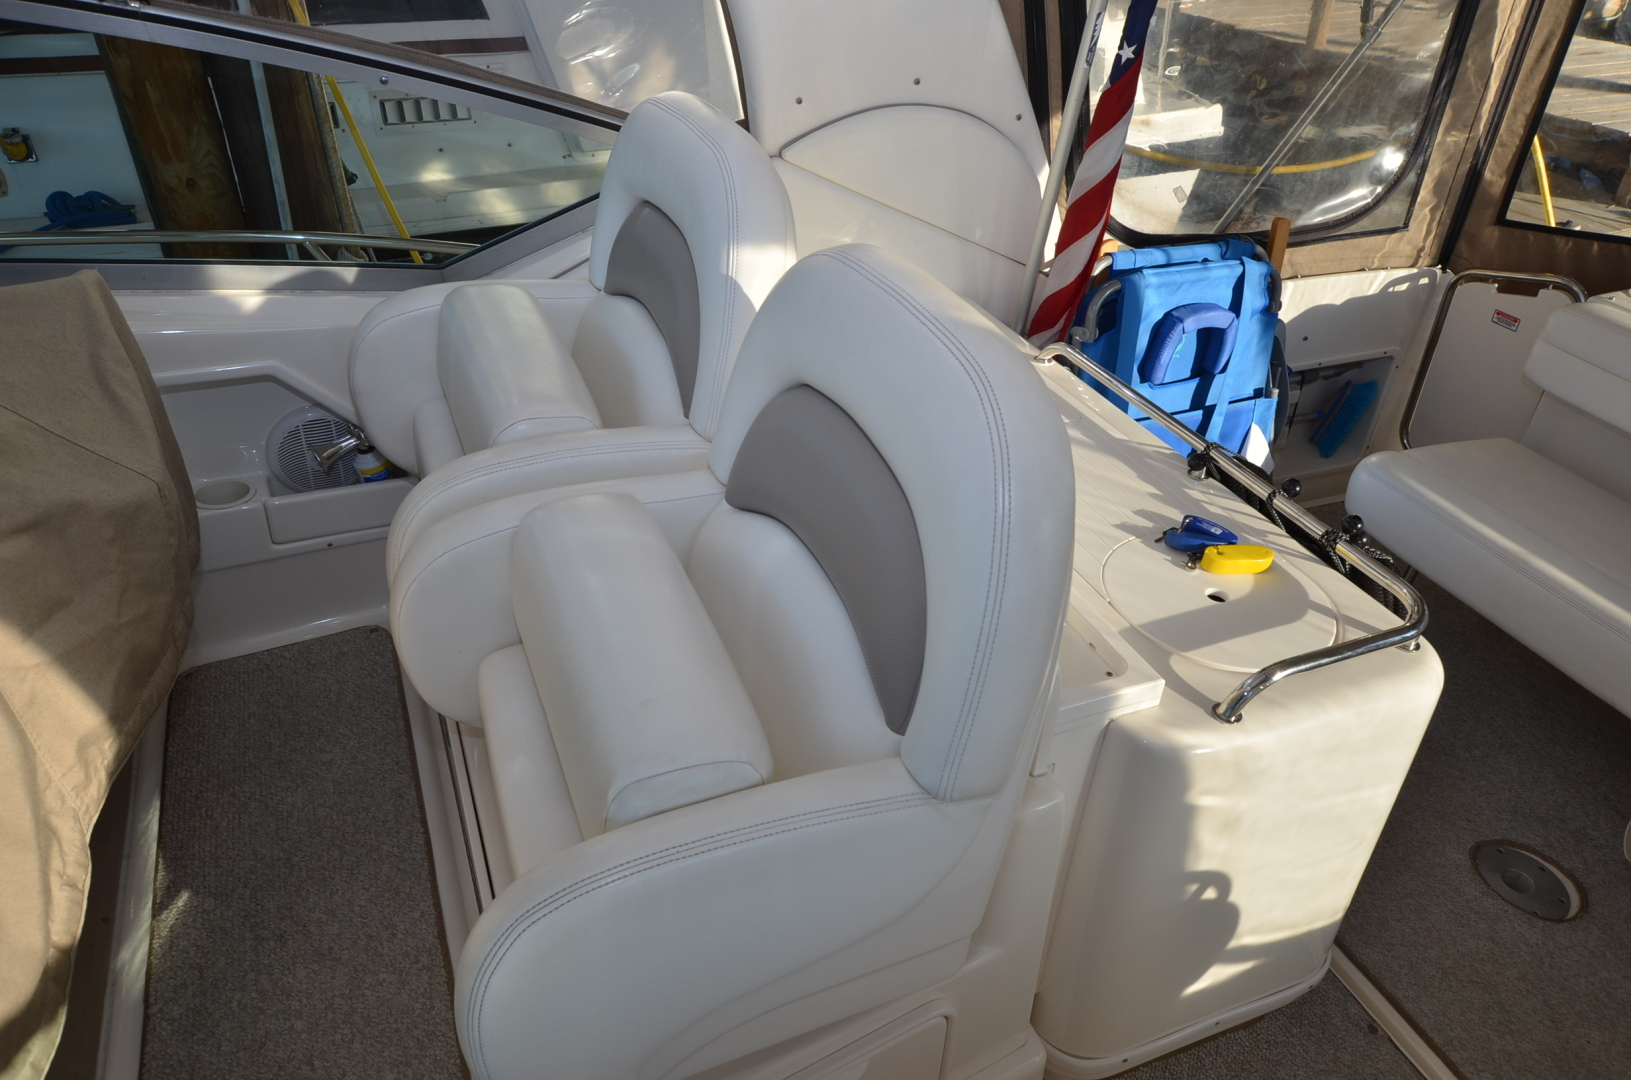 Sea Ray-340 Sundancer 2005-Better Place Palm Harbor-Florida-United States-1562802 | Thumbnail